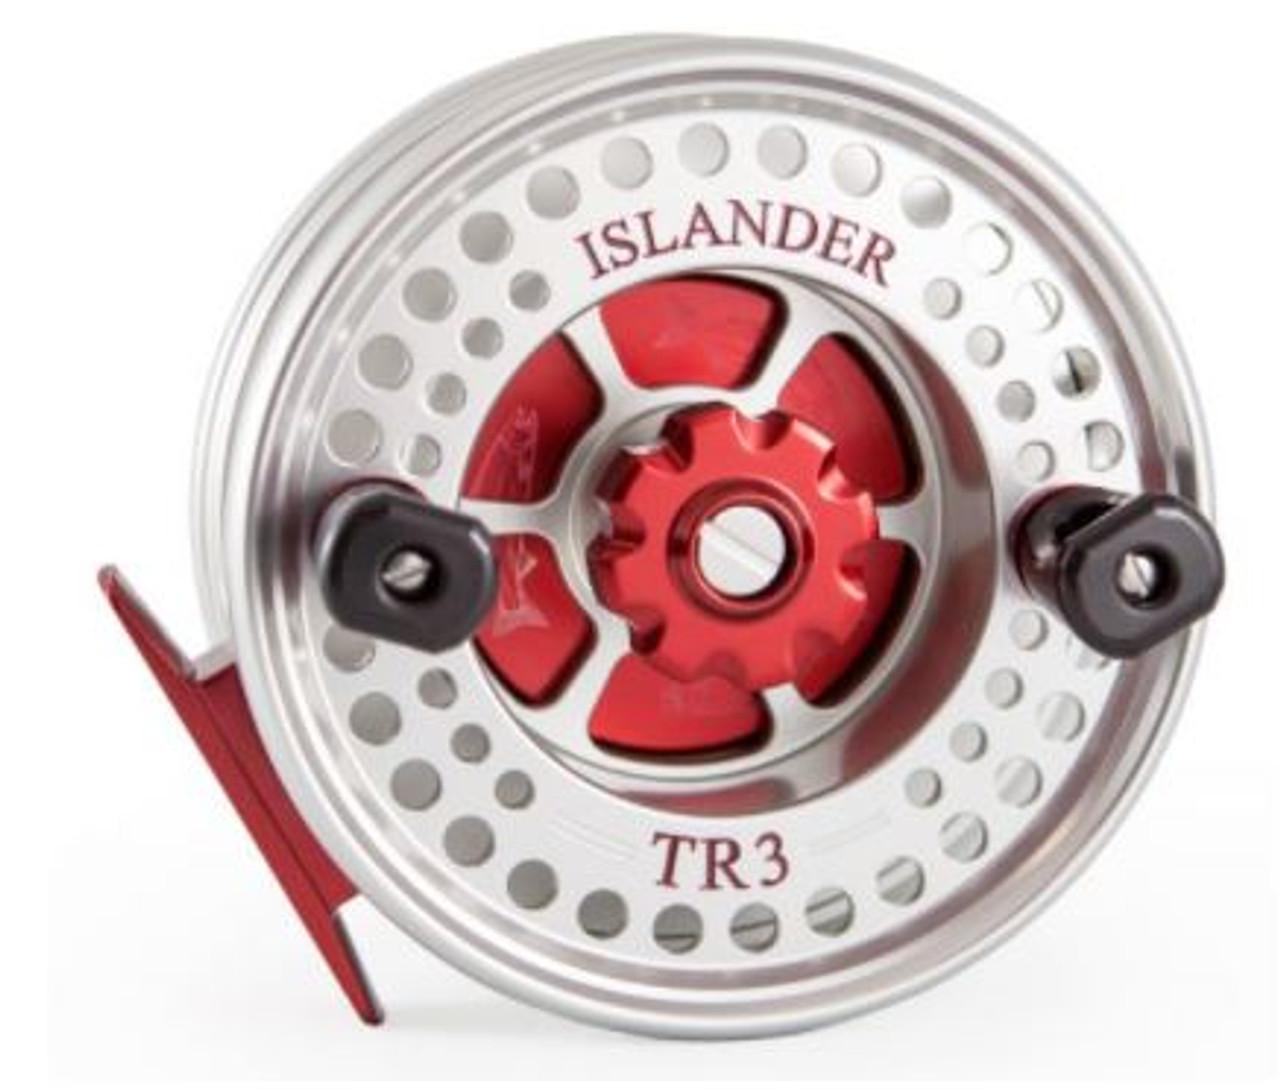 ISLANDER TR3